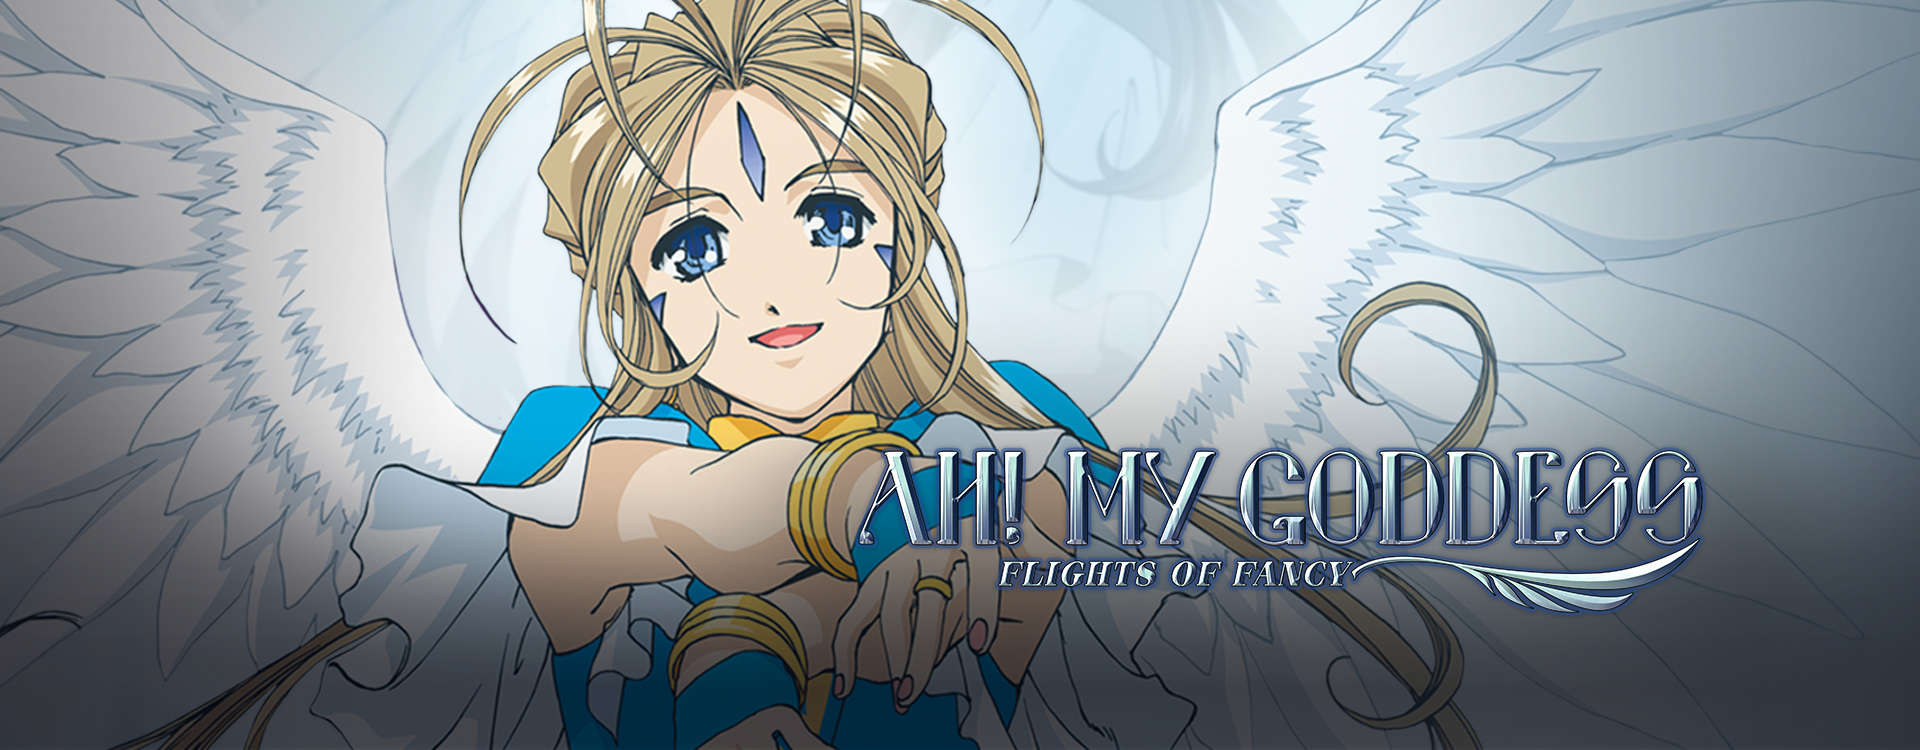 Ah! My Goddess: Flights of Fancy